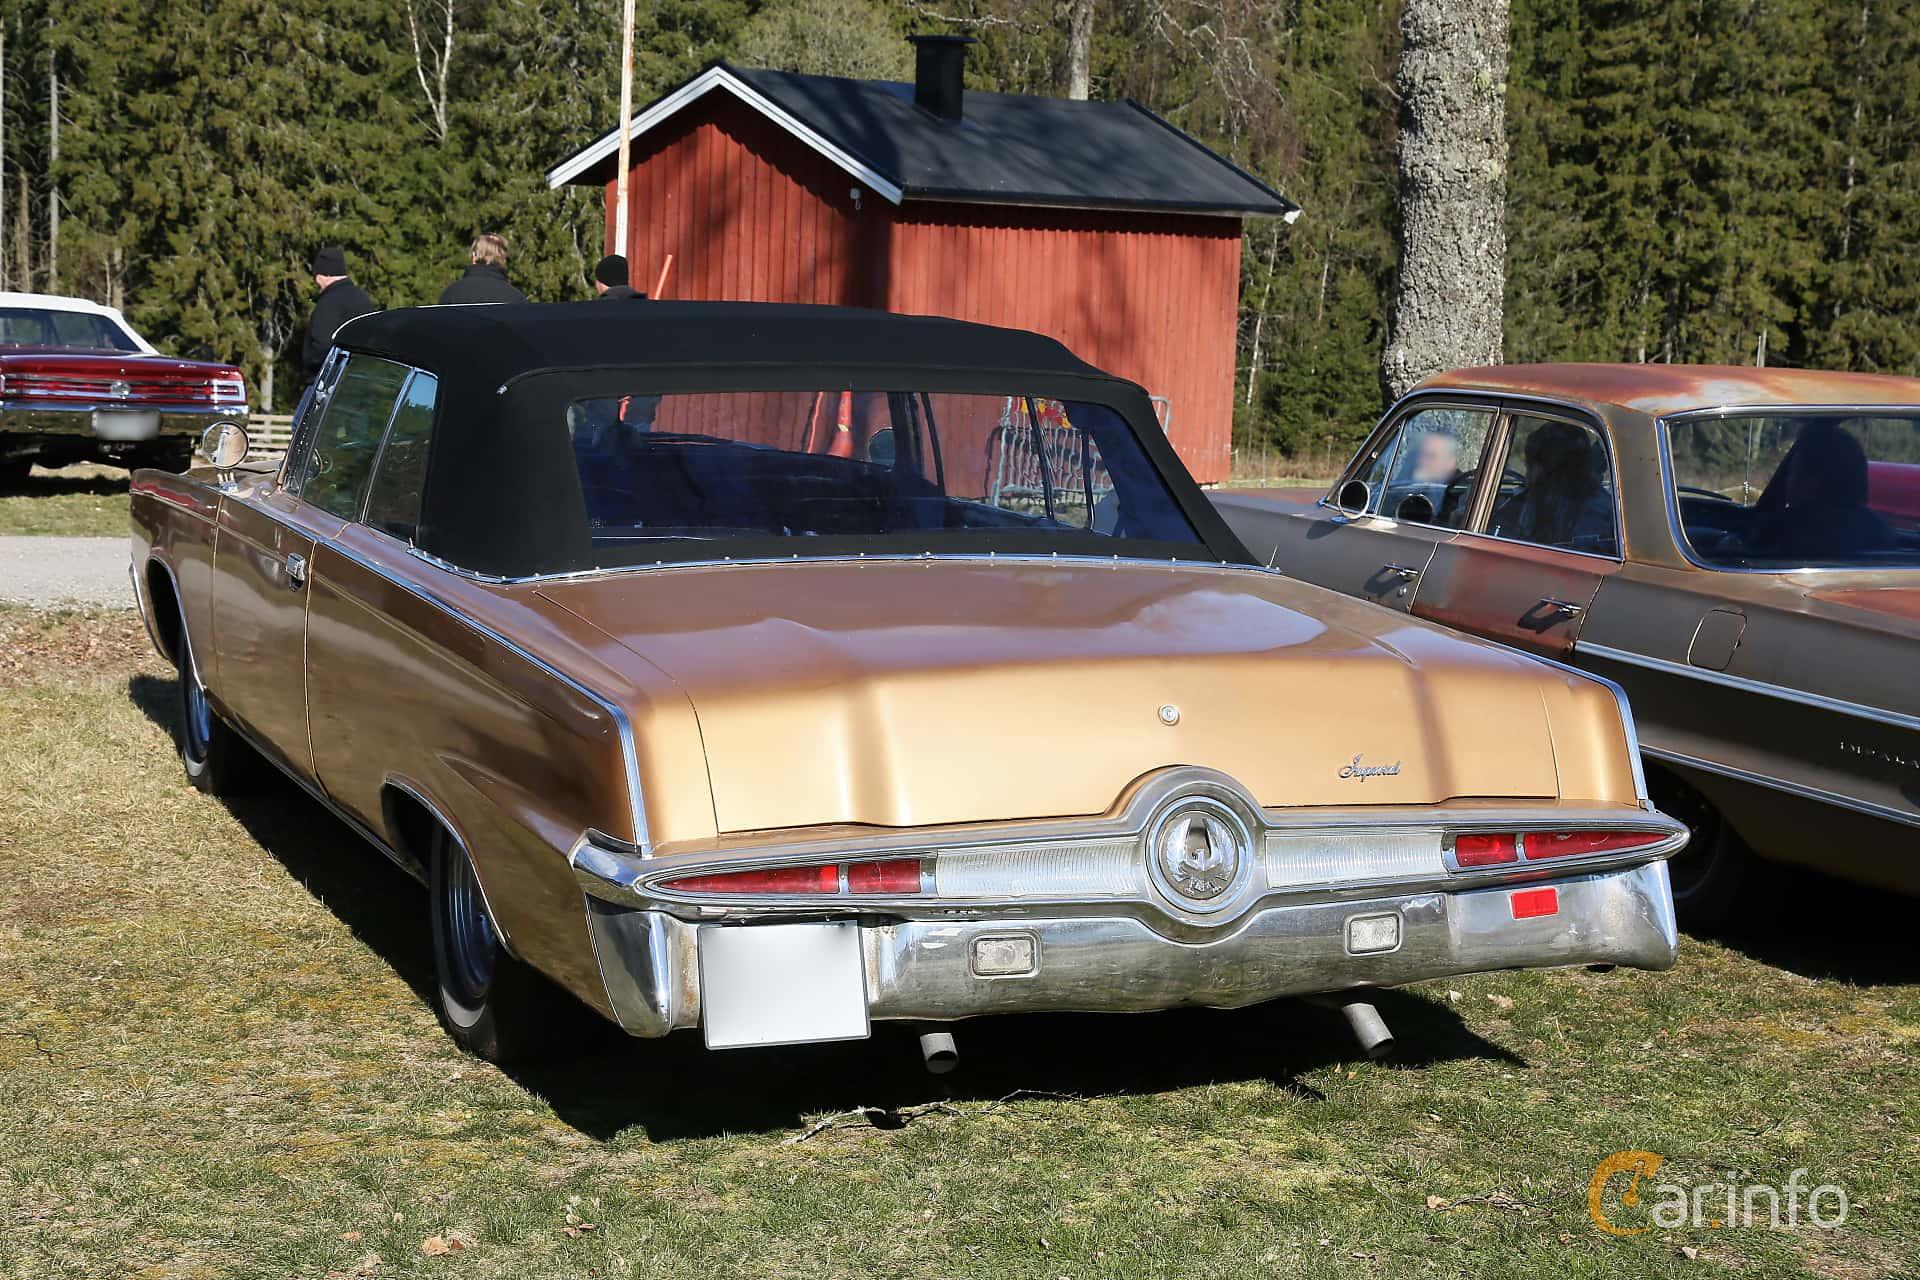 Imperial Crown Convertible 7.2 V8 TorqueFlite, 355hp, 1966 at Uddevalla Veteranbilsmarknad Backamo, Ljungsk 2019